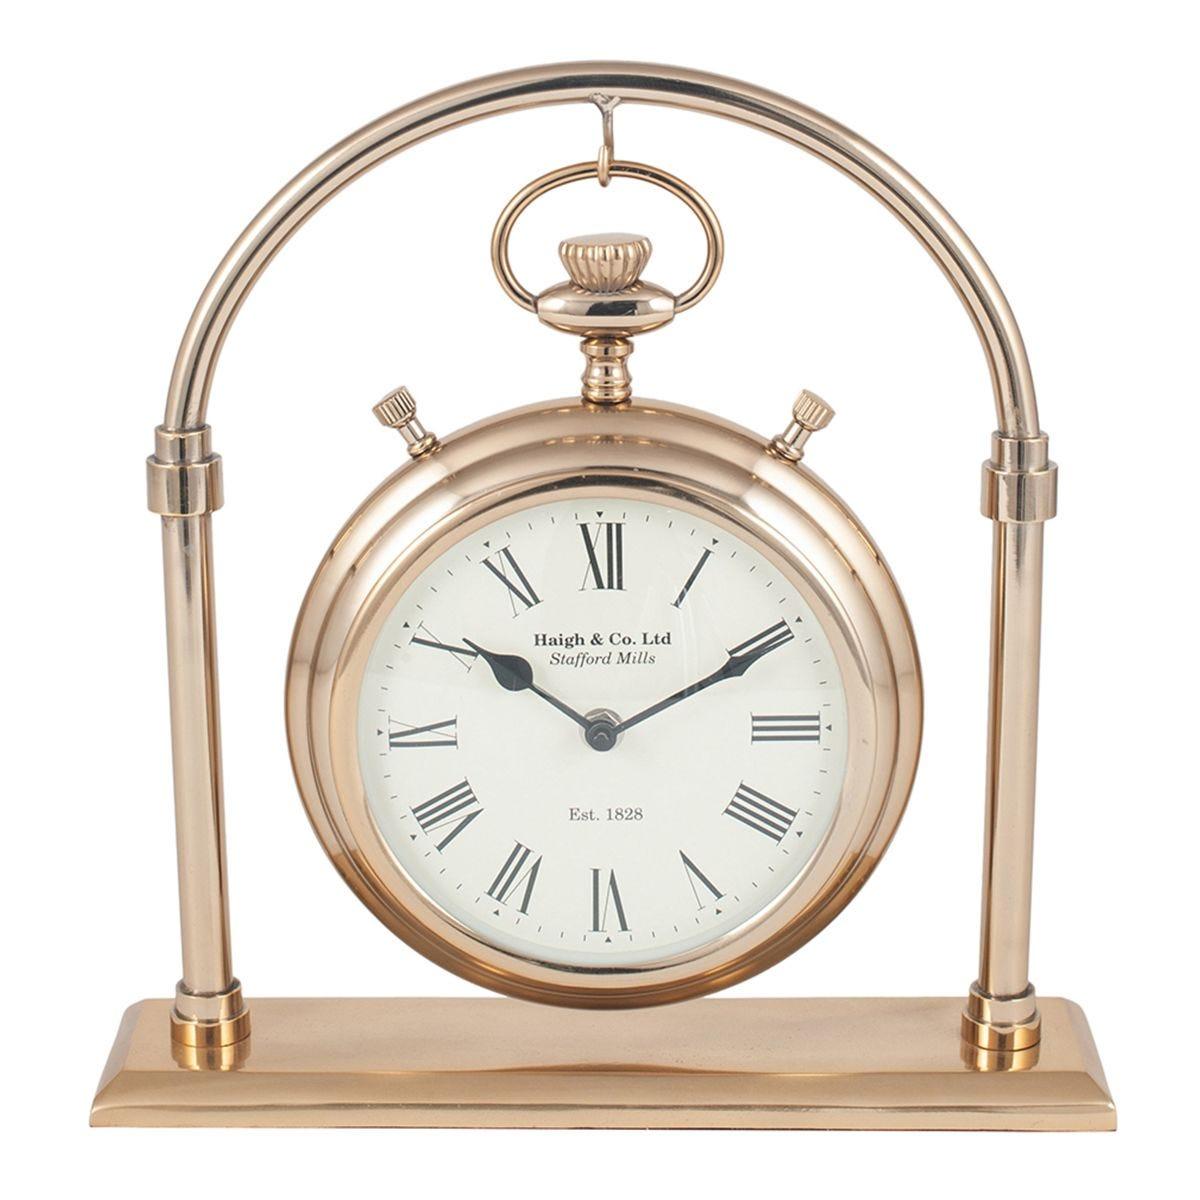 Celestial Antique Brass & Glass Carriage Clock